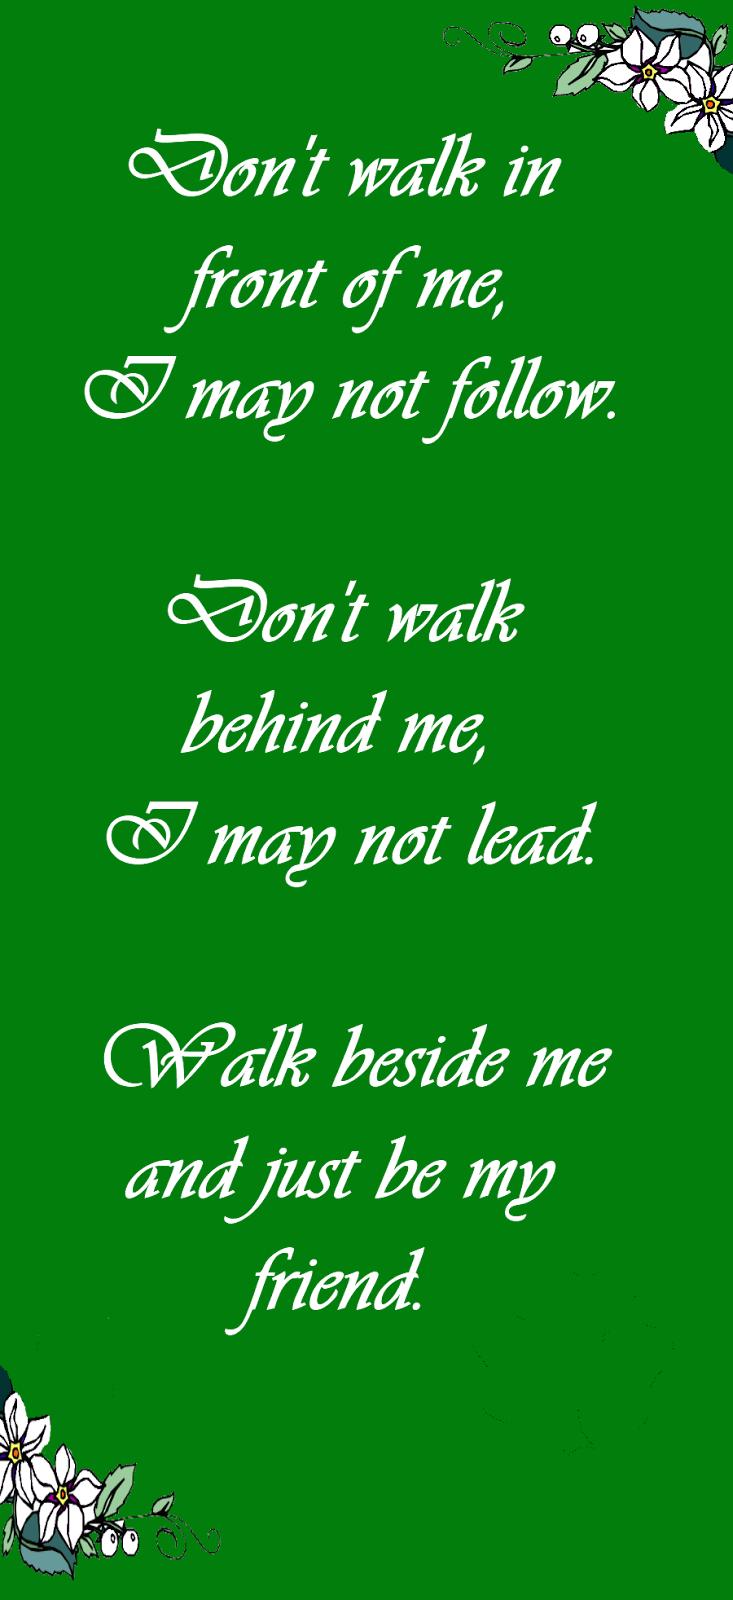 Wonderful Irish Quotes About Friendship Irish Quotes About Friendship 20 Quotesbae